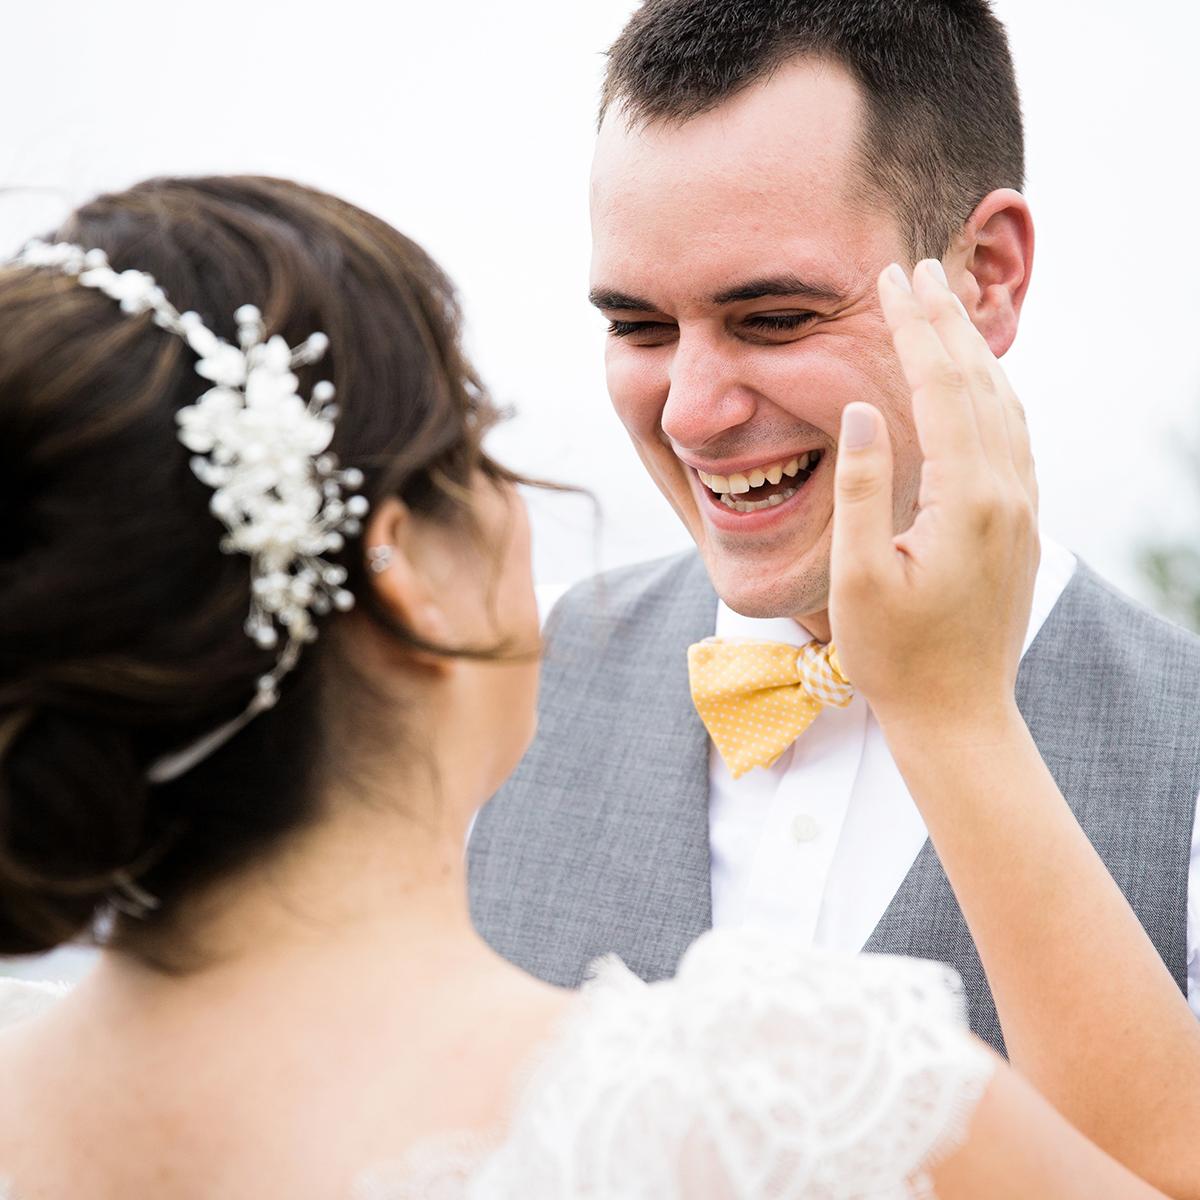 Laurel & Robert - Enger Park, Duluth Wedding